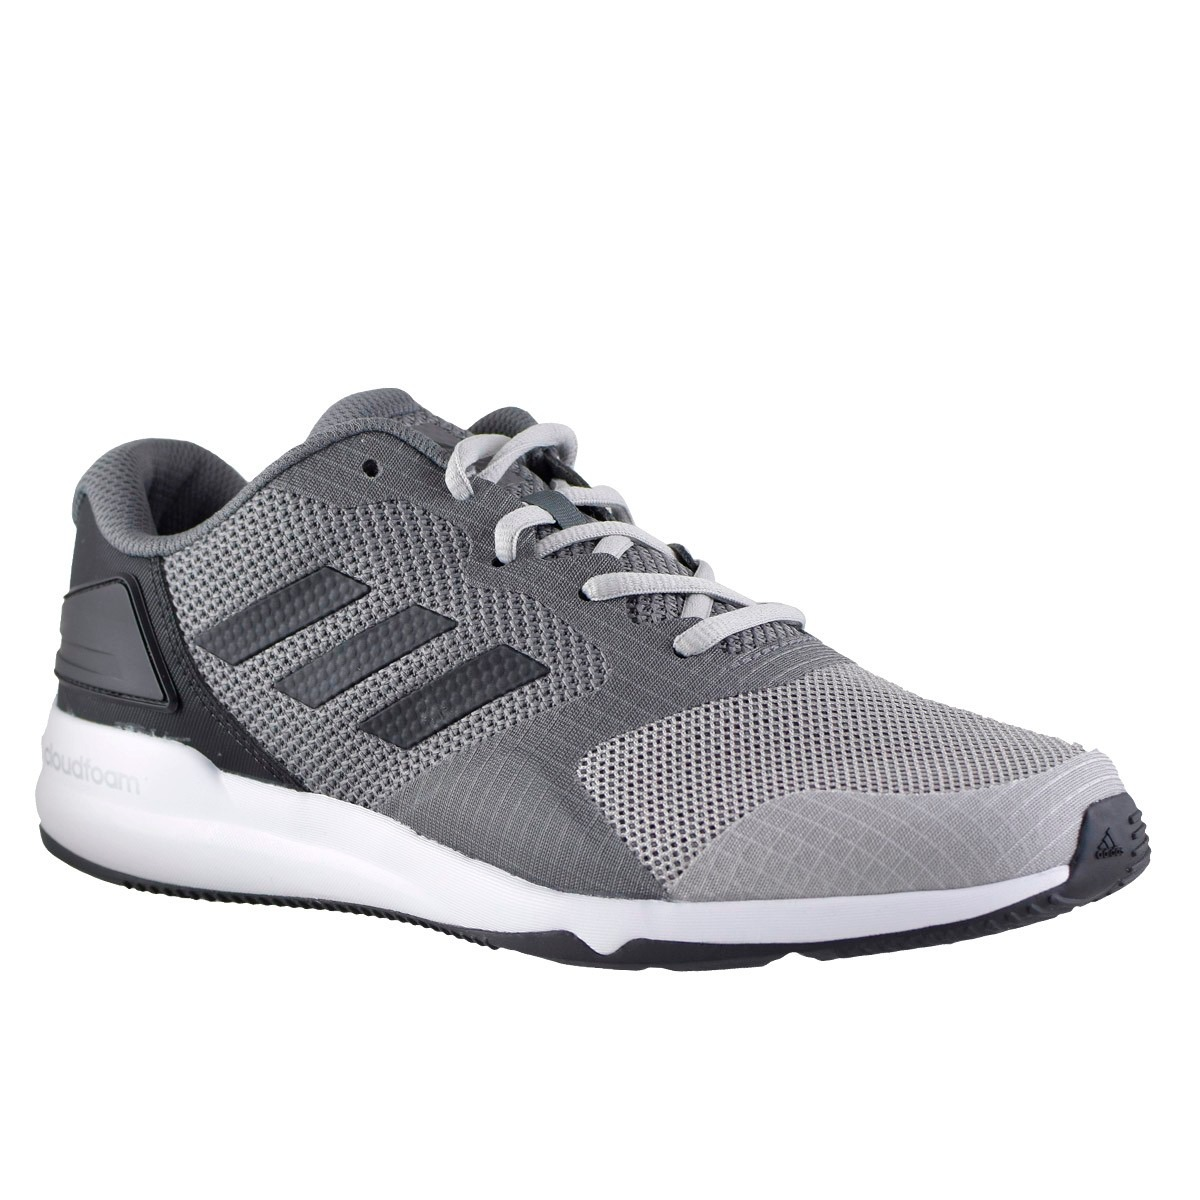 size 40 41302 7c78f Zapatillas adidas Crazytrain 2.0 Cloudfoam Hombre Gris - $ 1.800,00 ...